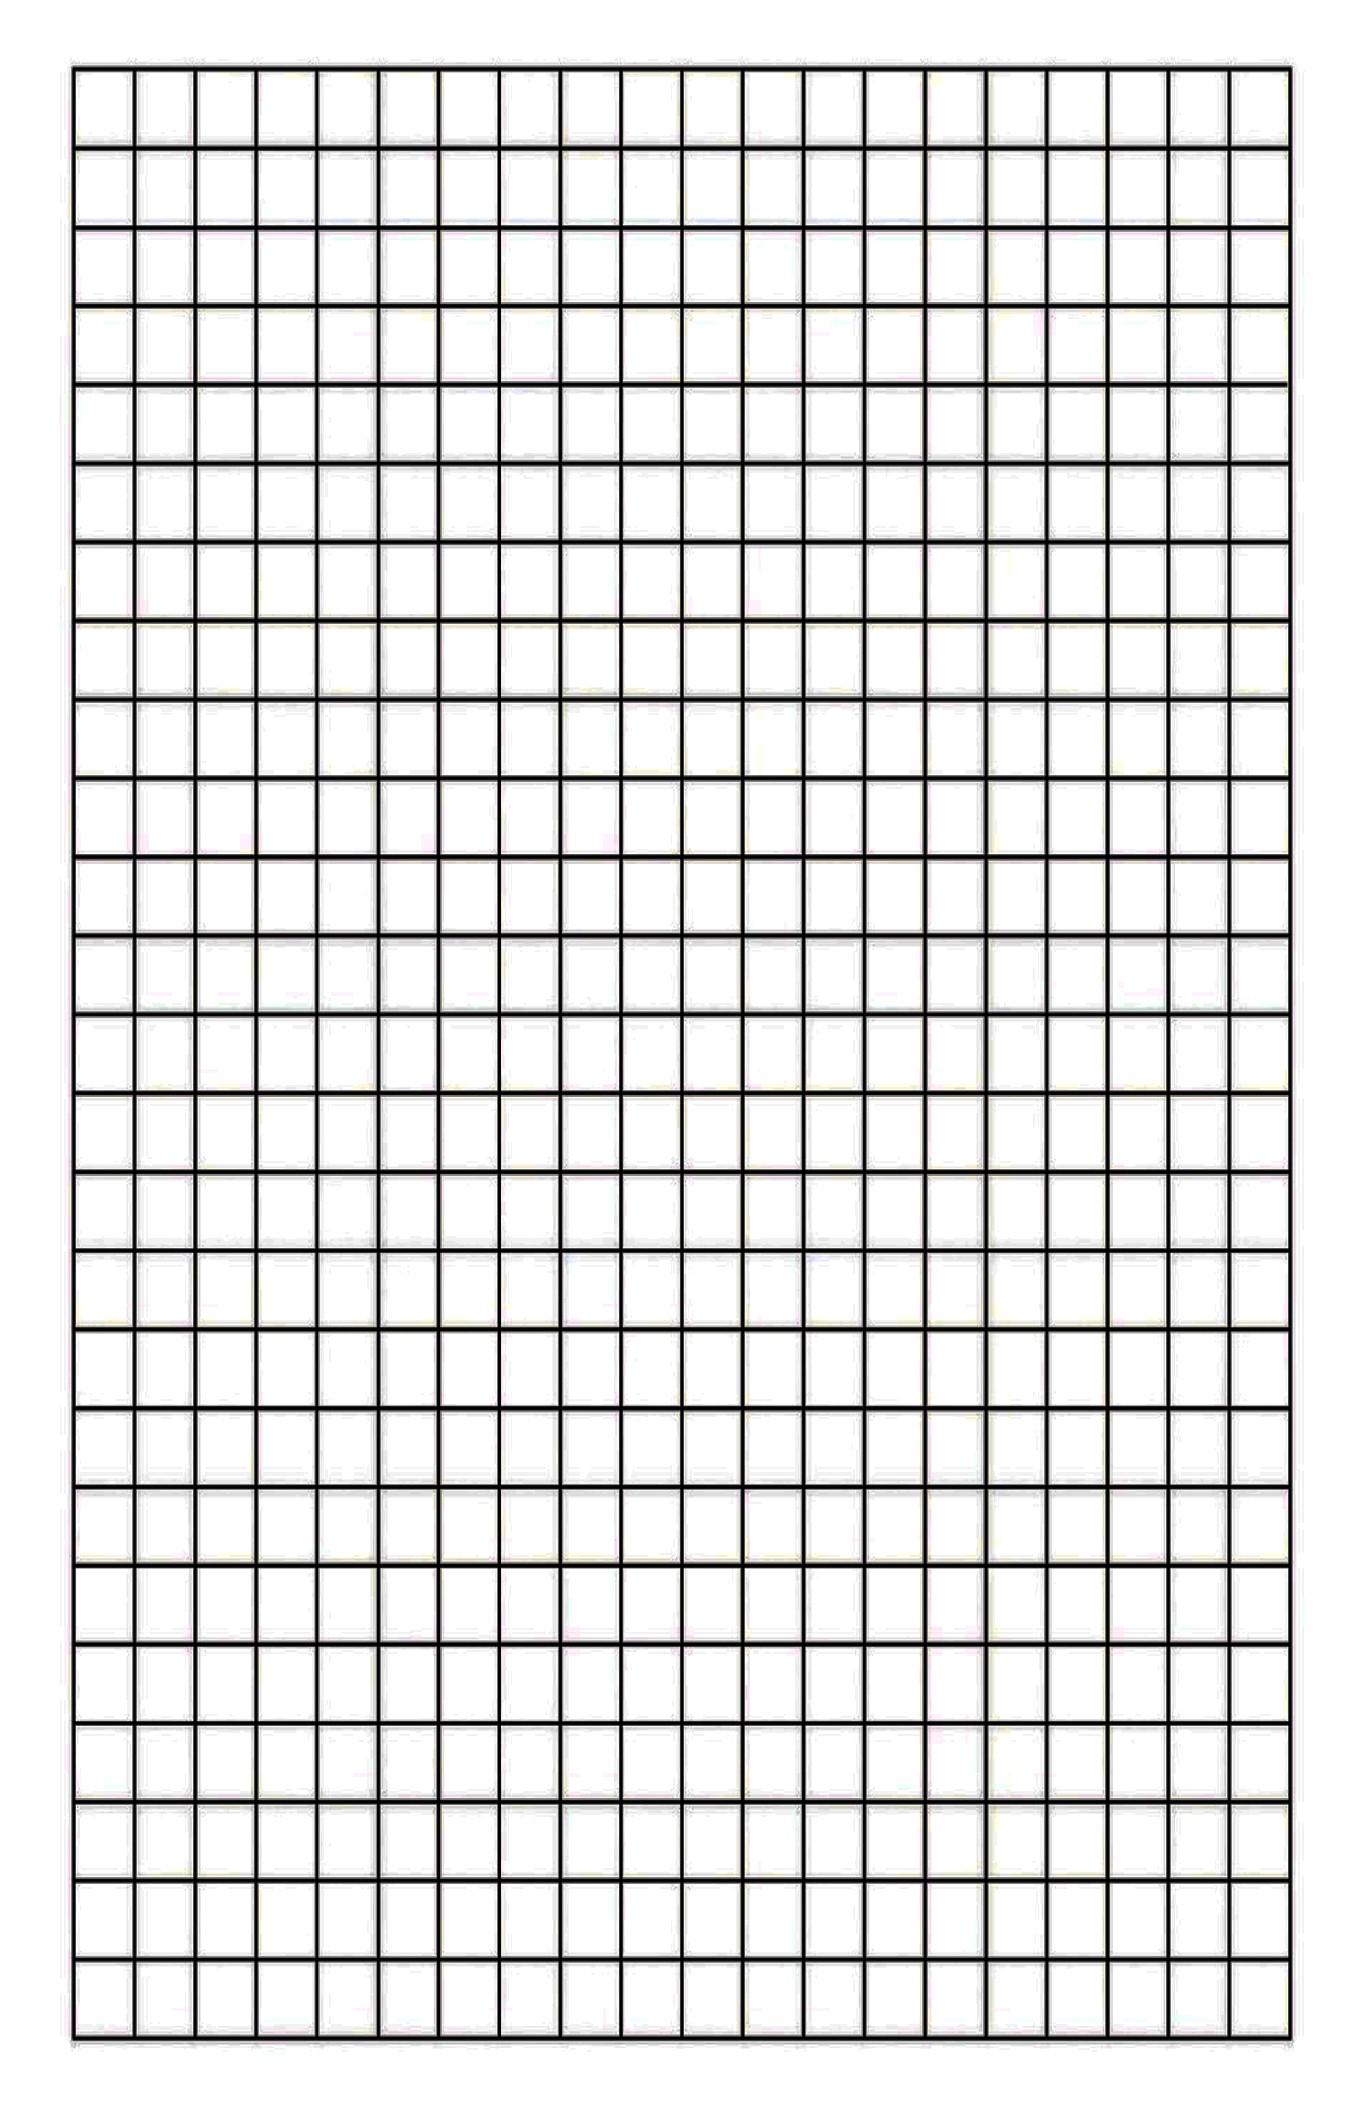 Free Printable Blank Graph Paper